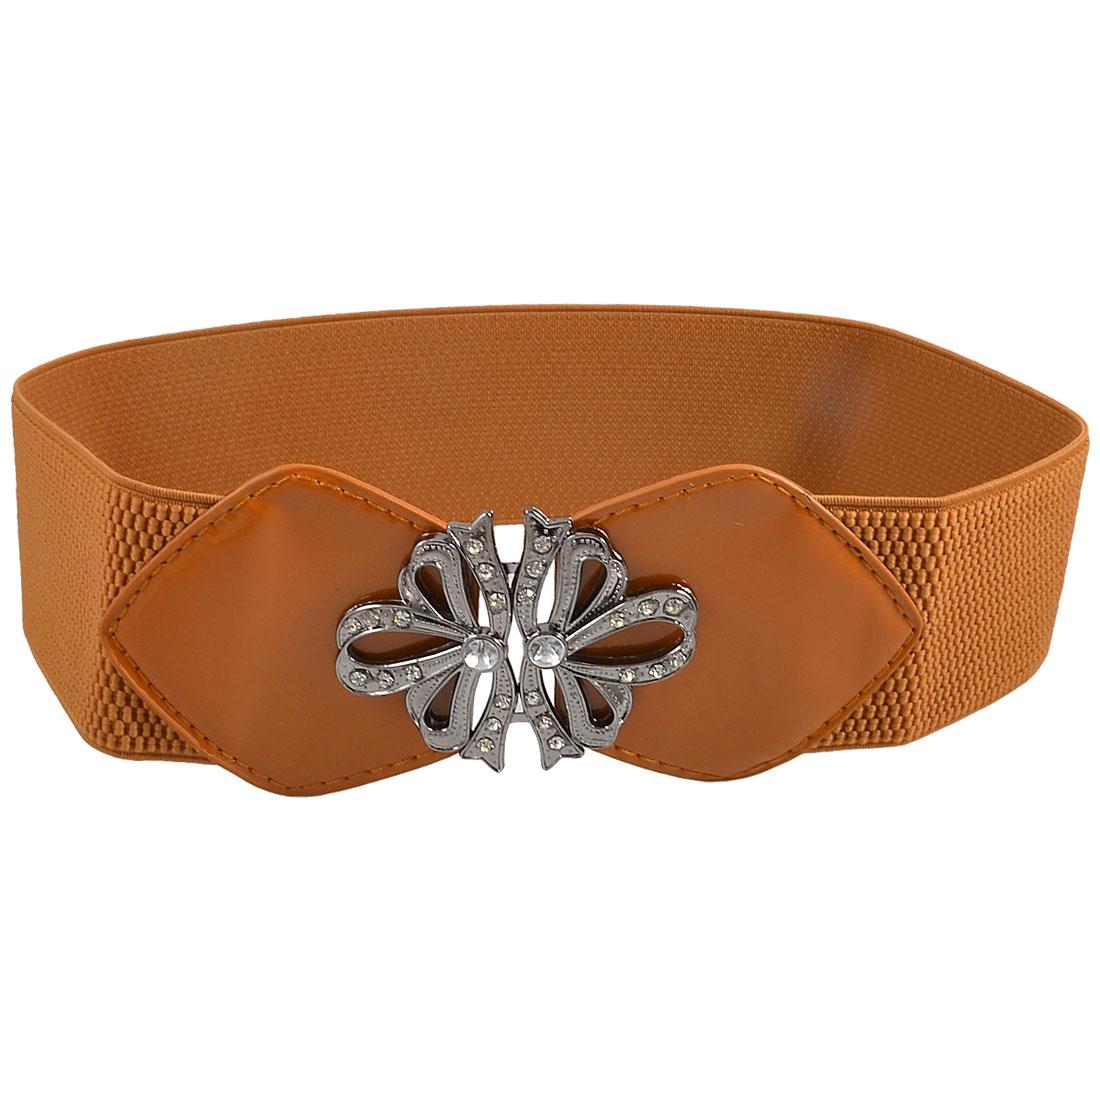 Rhinestone Inlaid Metal Flower Accent Brown Stretchy Waist Belt Band for Ladies